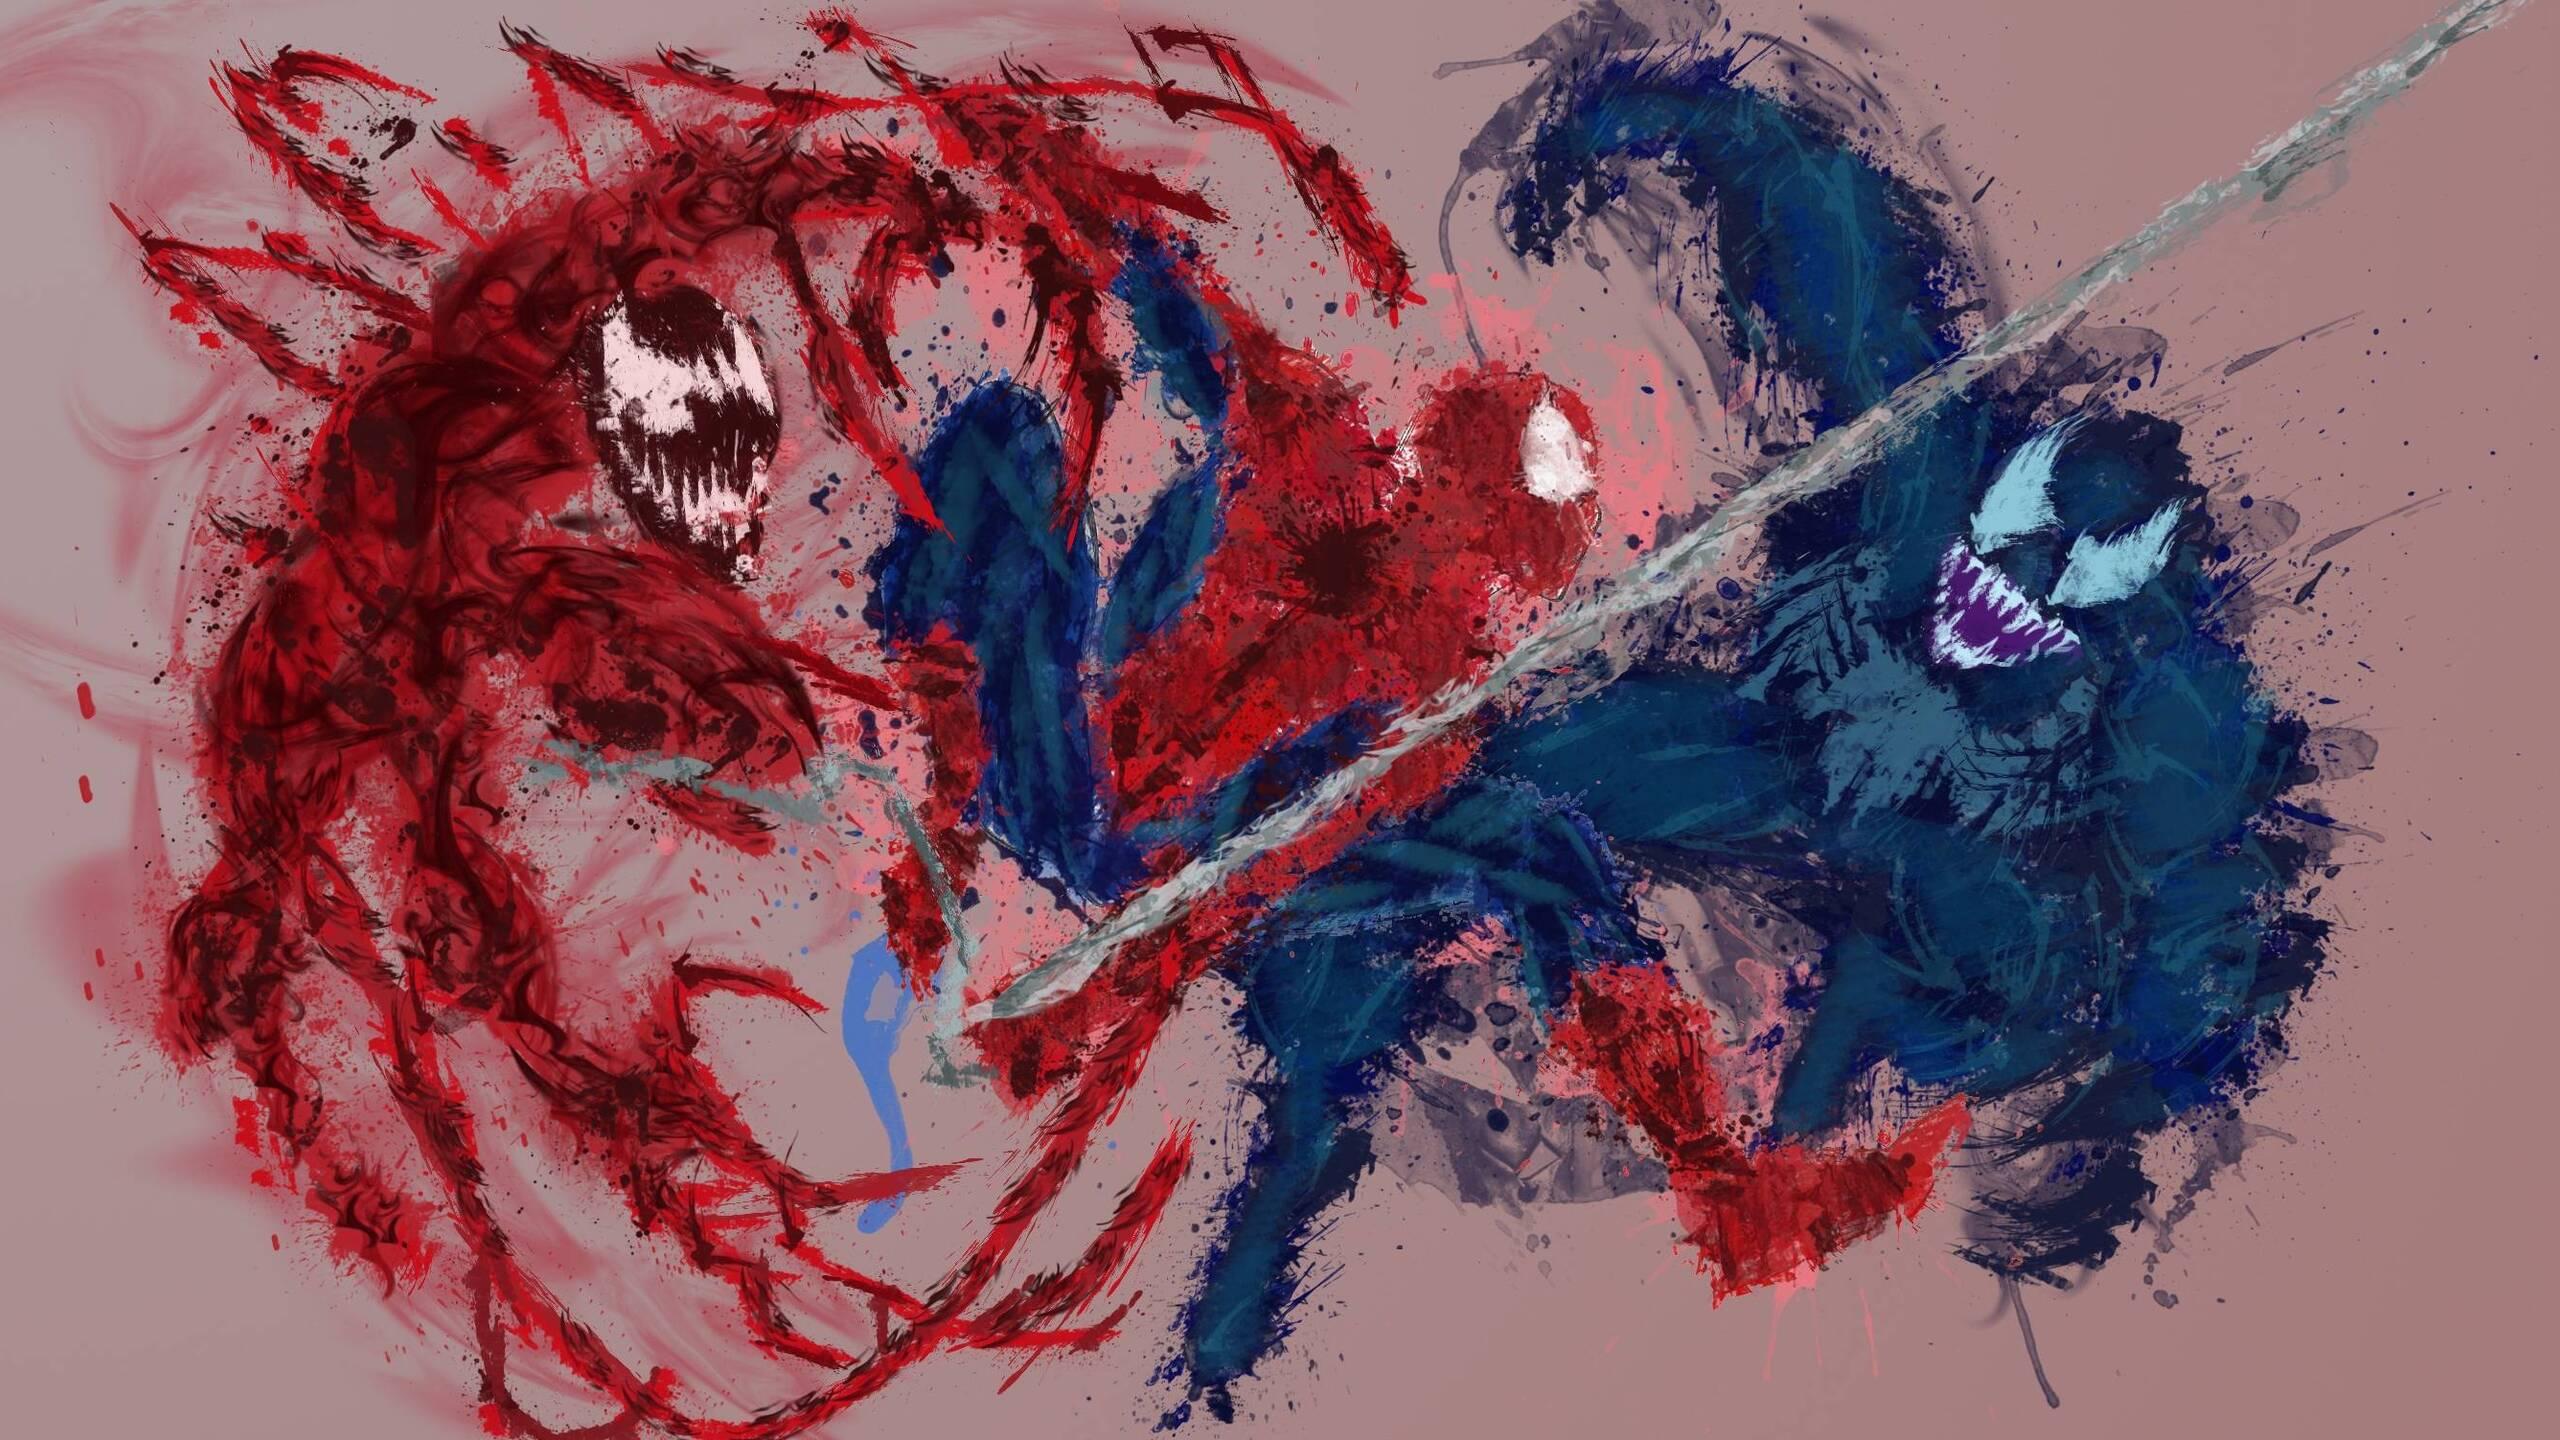 spidey-venom-and-carnage-artwork-gg.jpg